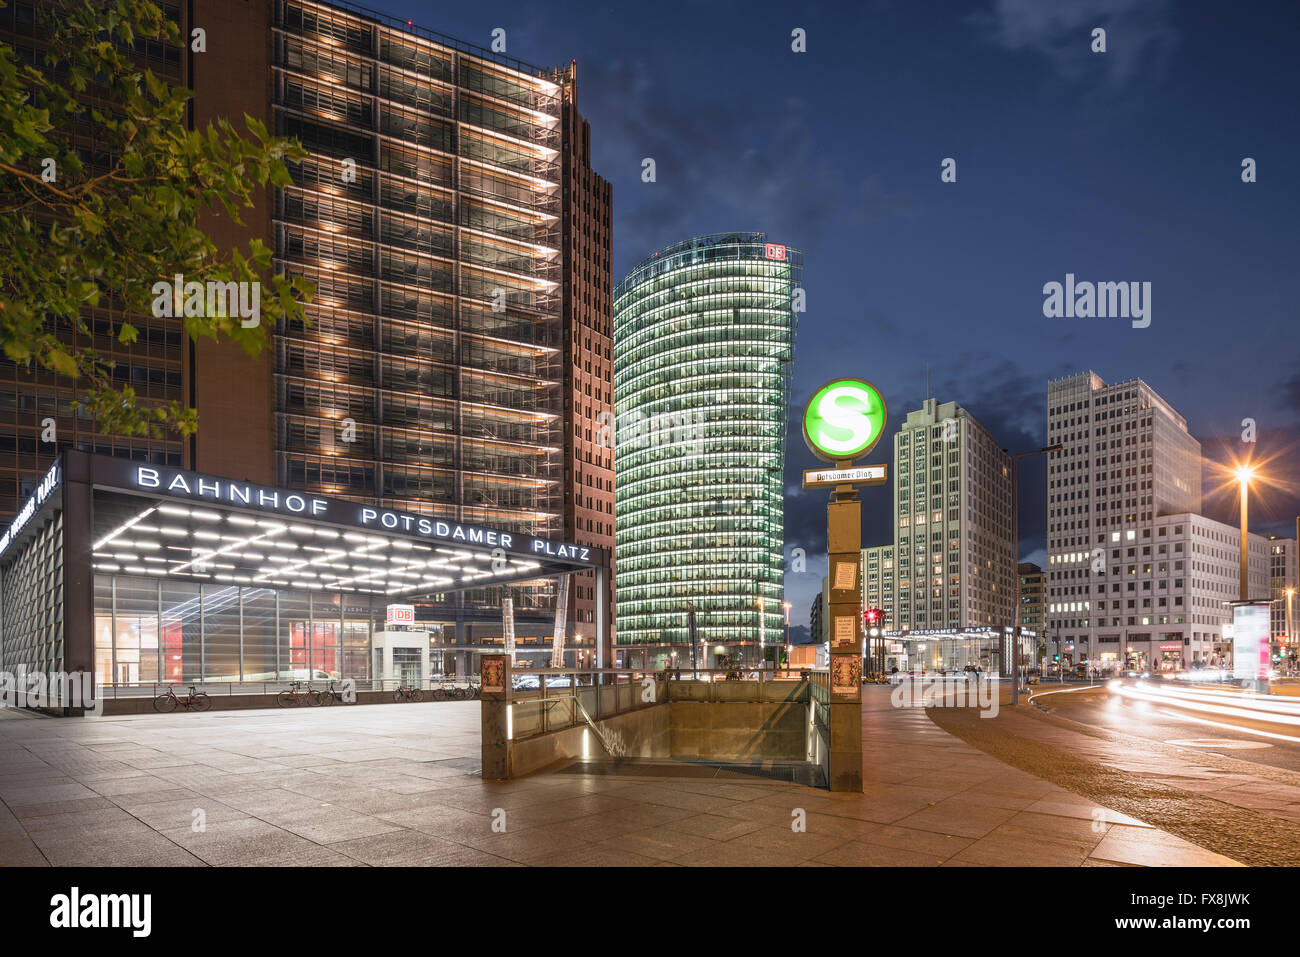 Potsdamer Platz, Berlin, DB Tower, S-Bahn-Eingang, Berlin Mitte, Deutschland Stockbild